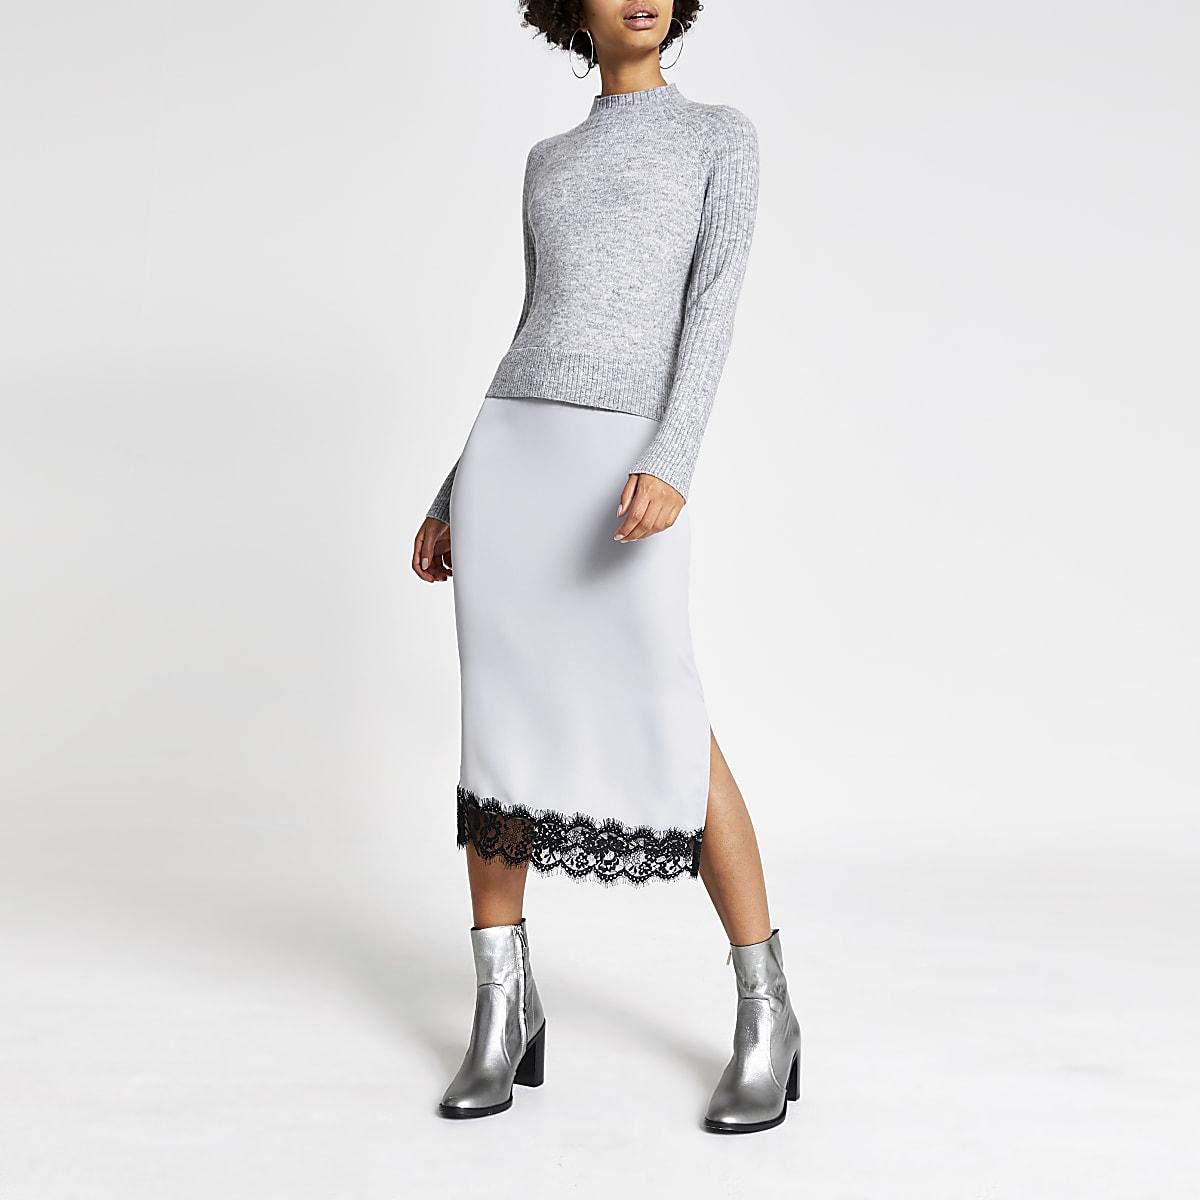 Grijze satijnen midi trui-jurk met kant